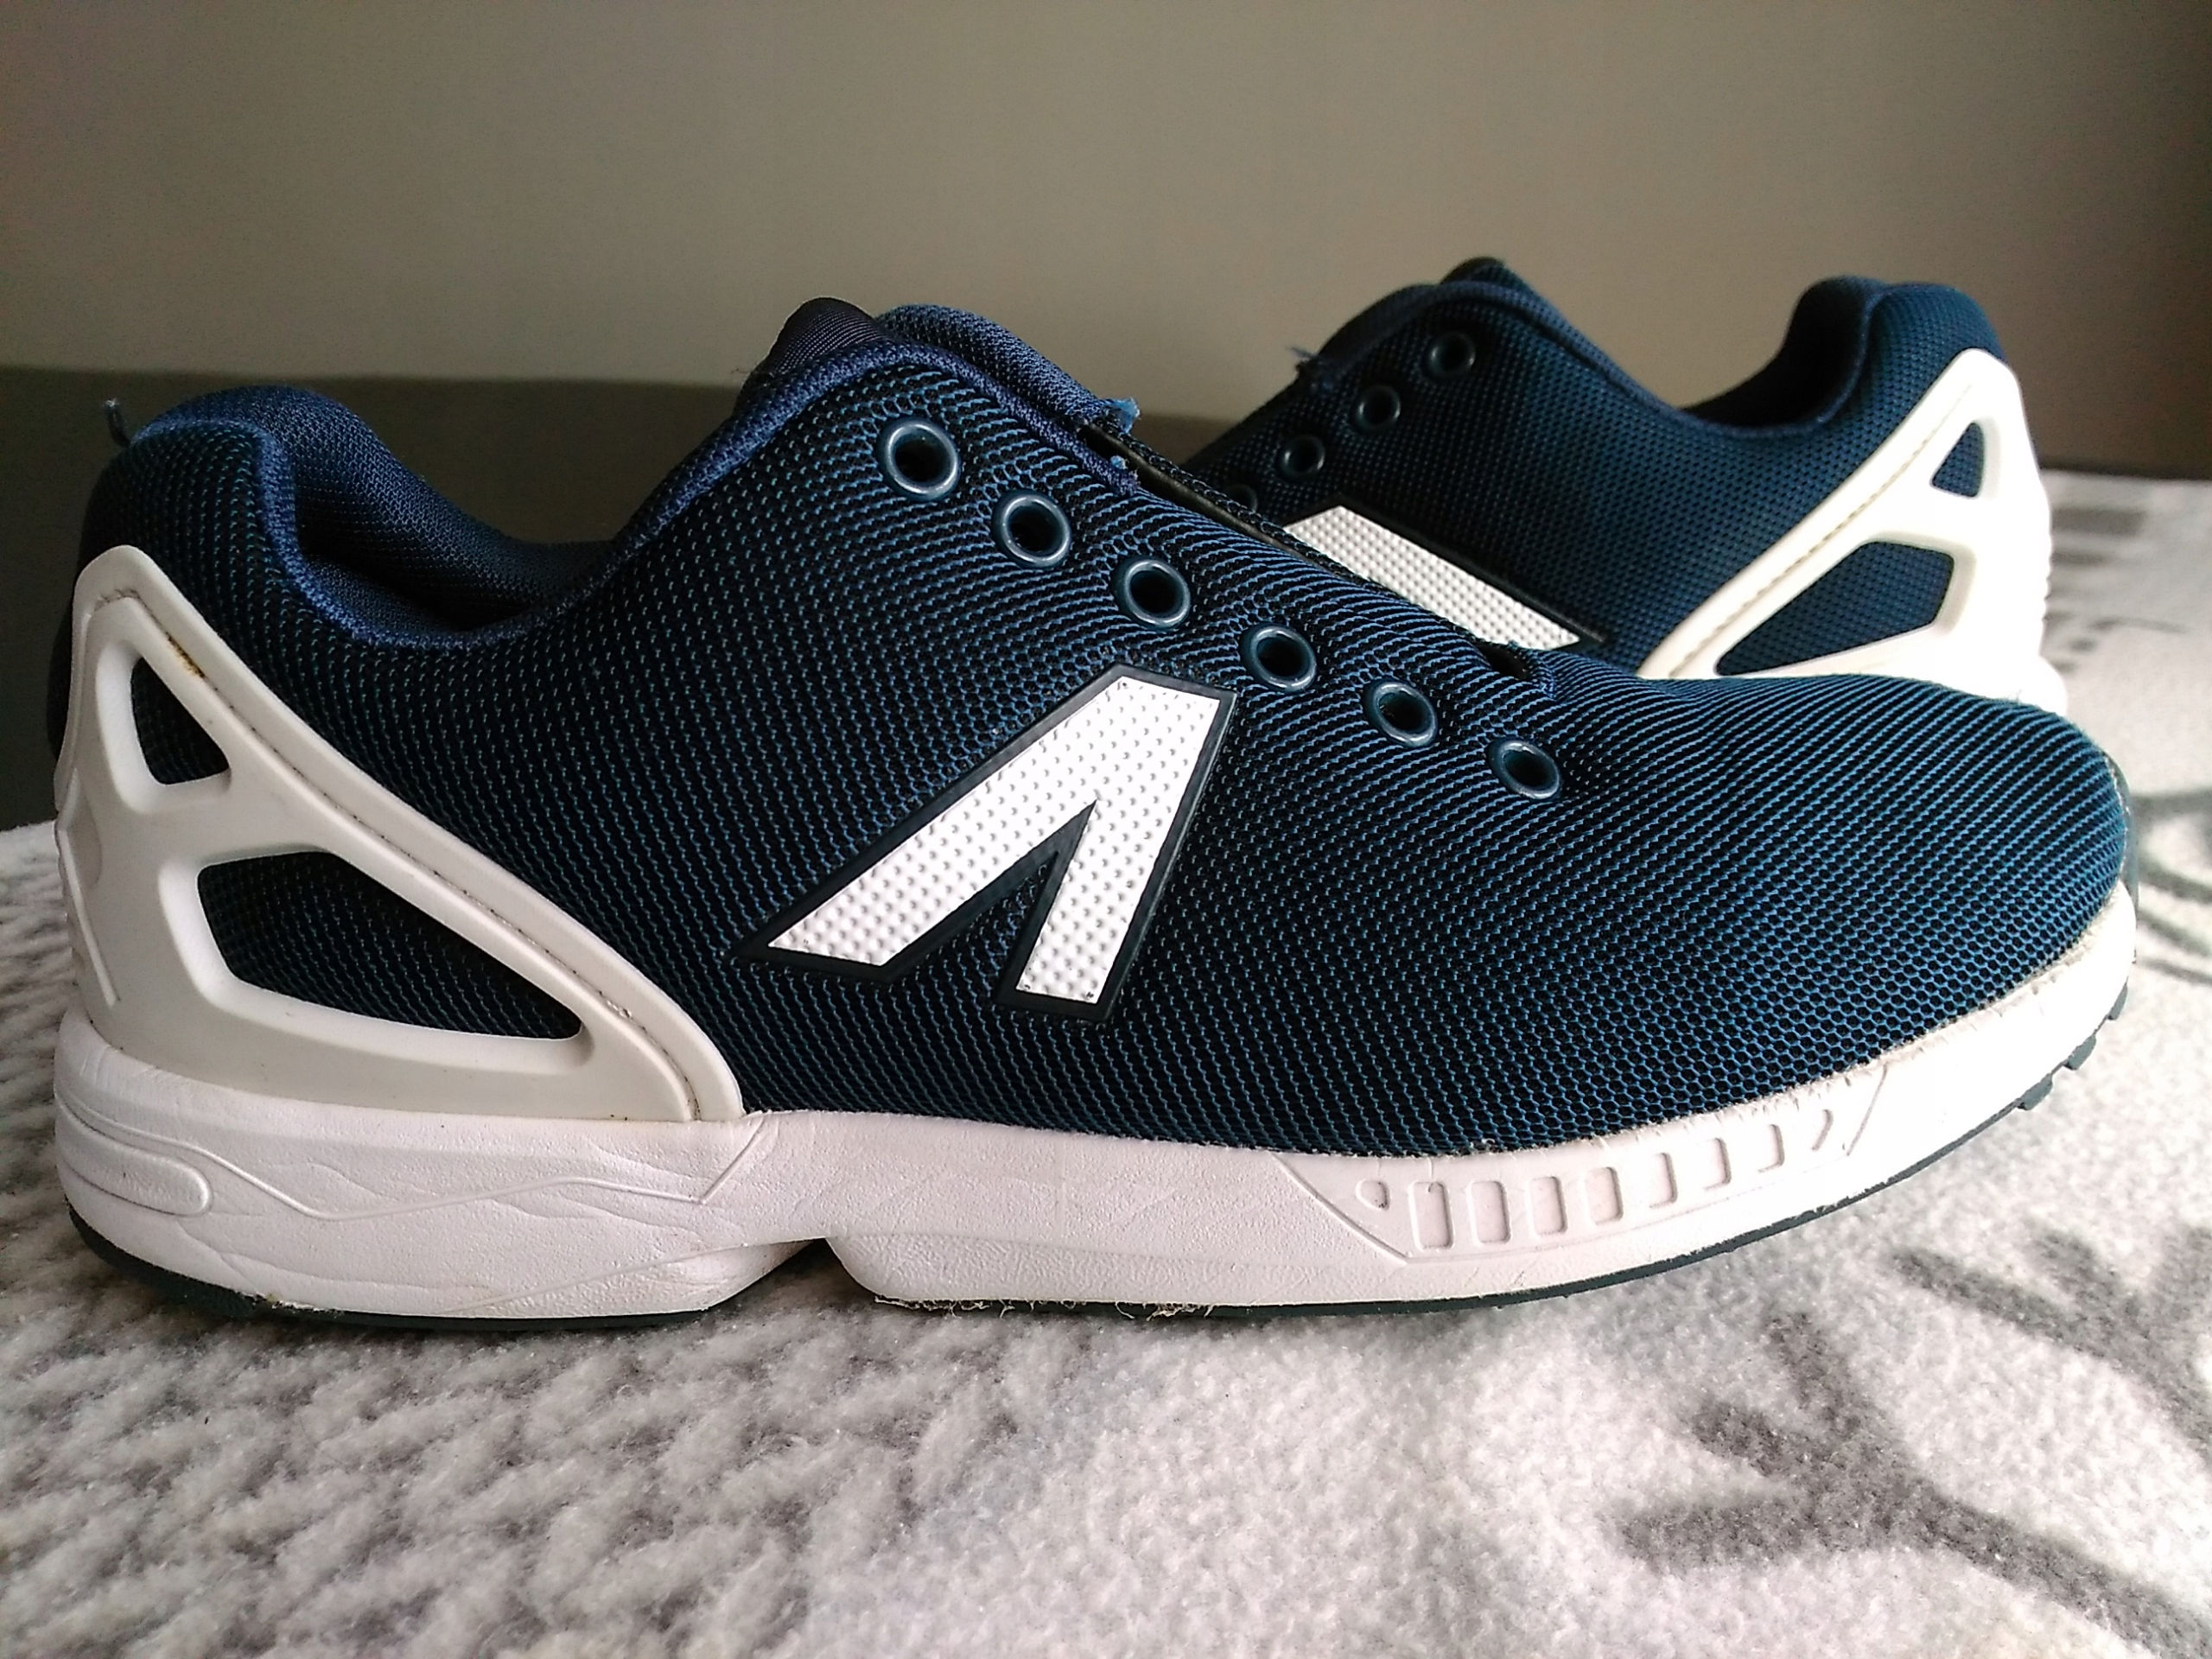 Buty sportowe American CLUB rozmiar 37 Adidasy